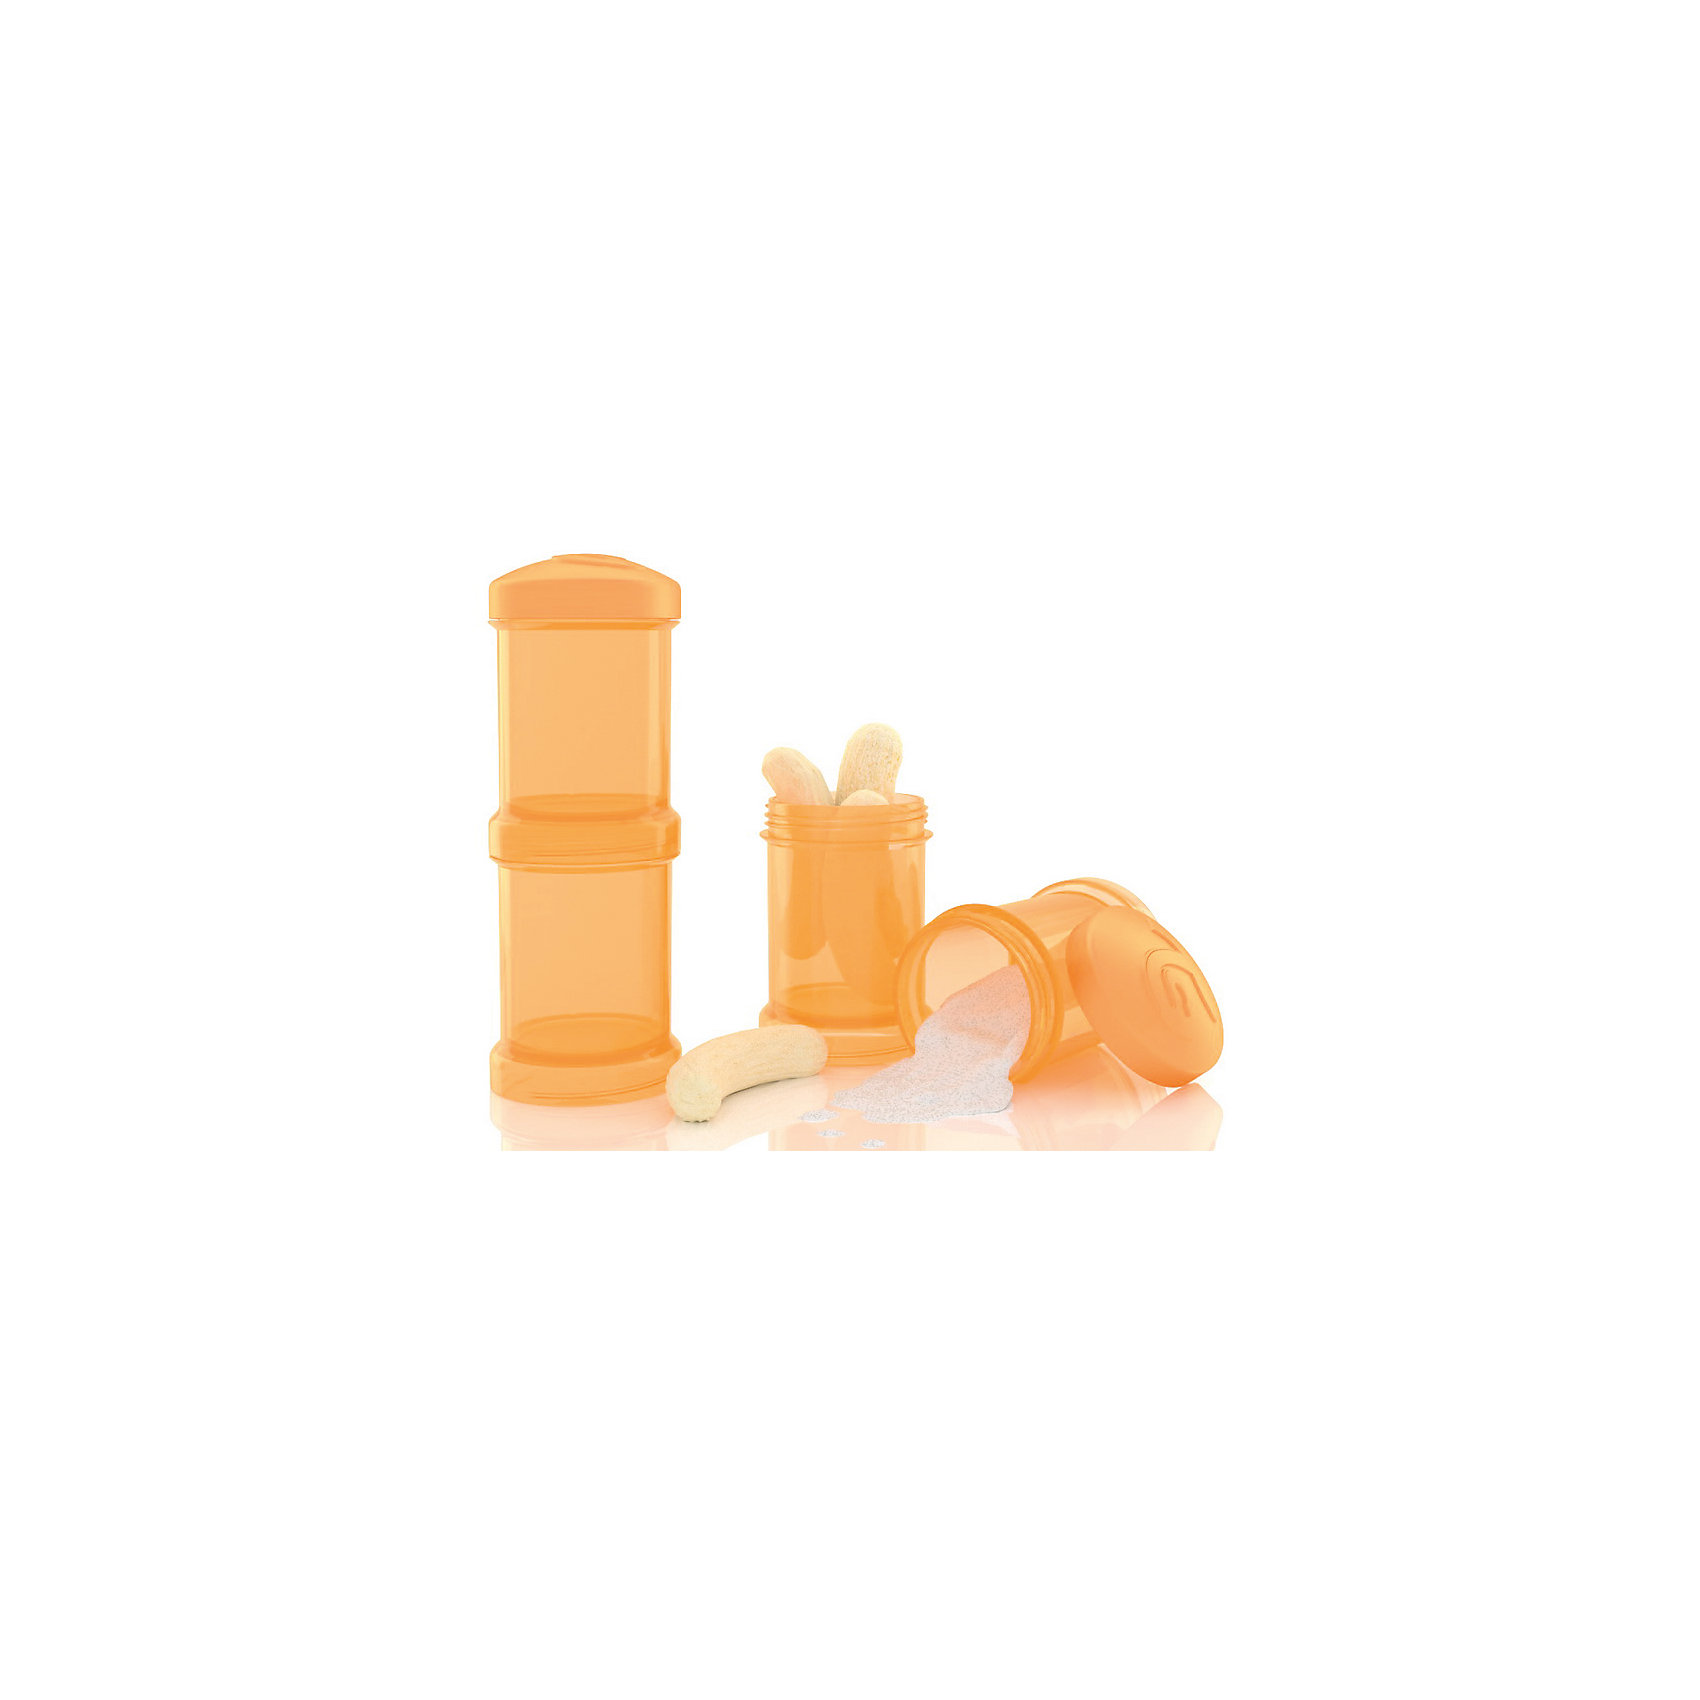 Контейнер для сухой смеси 100 мл. 2 шт., TwistShake, оранжевый (Twistshake)